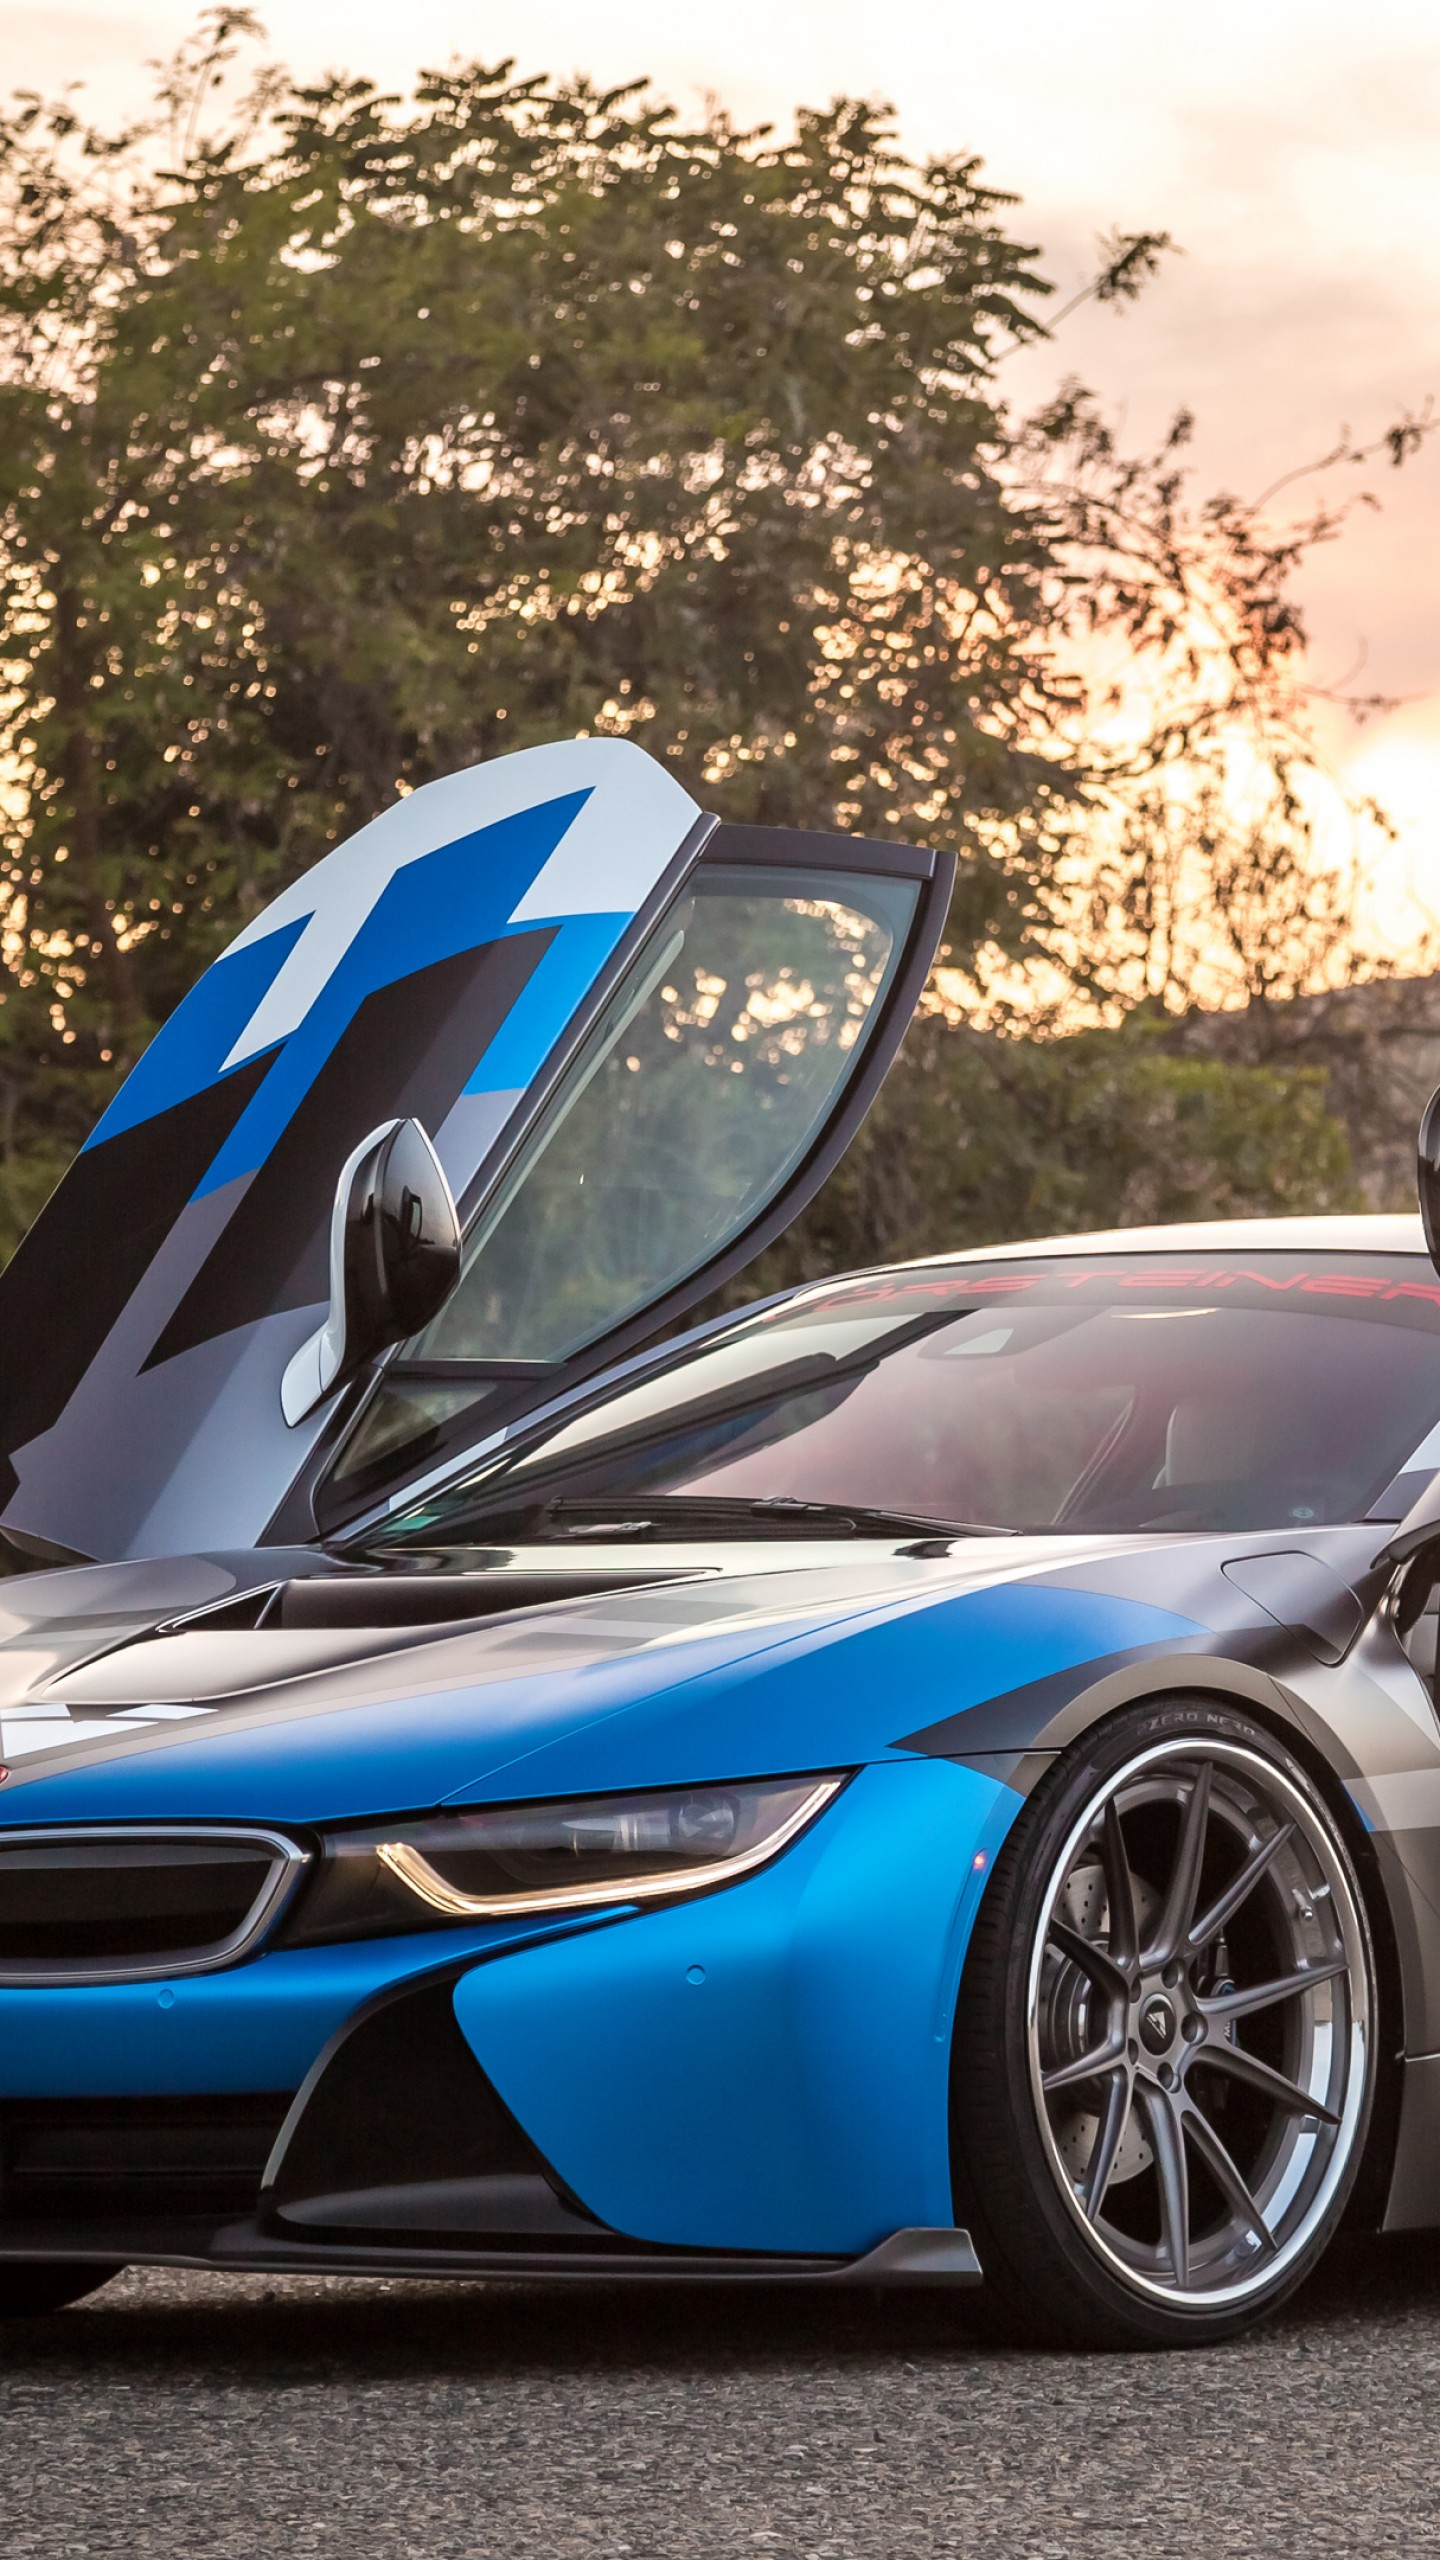 Wallpaper Vorsteiner Vr E Bmw I8 Supercar Sport Cars Blue Cars Bikes 10768